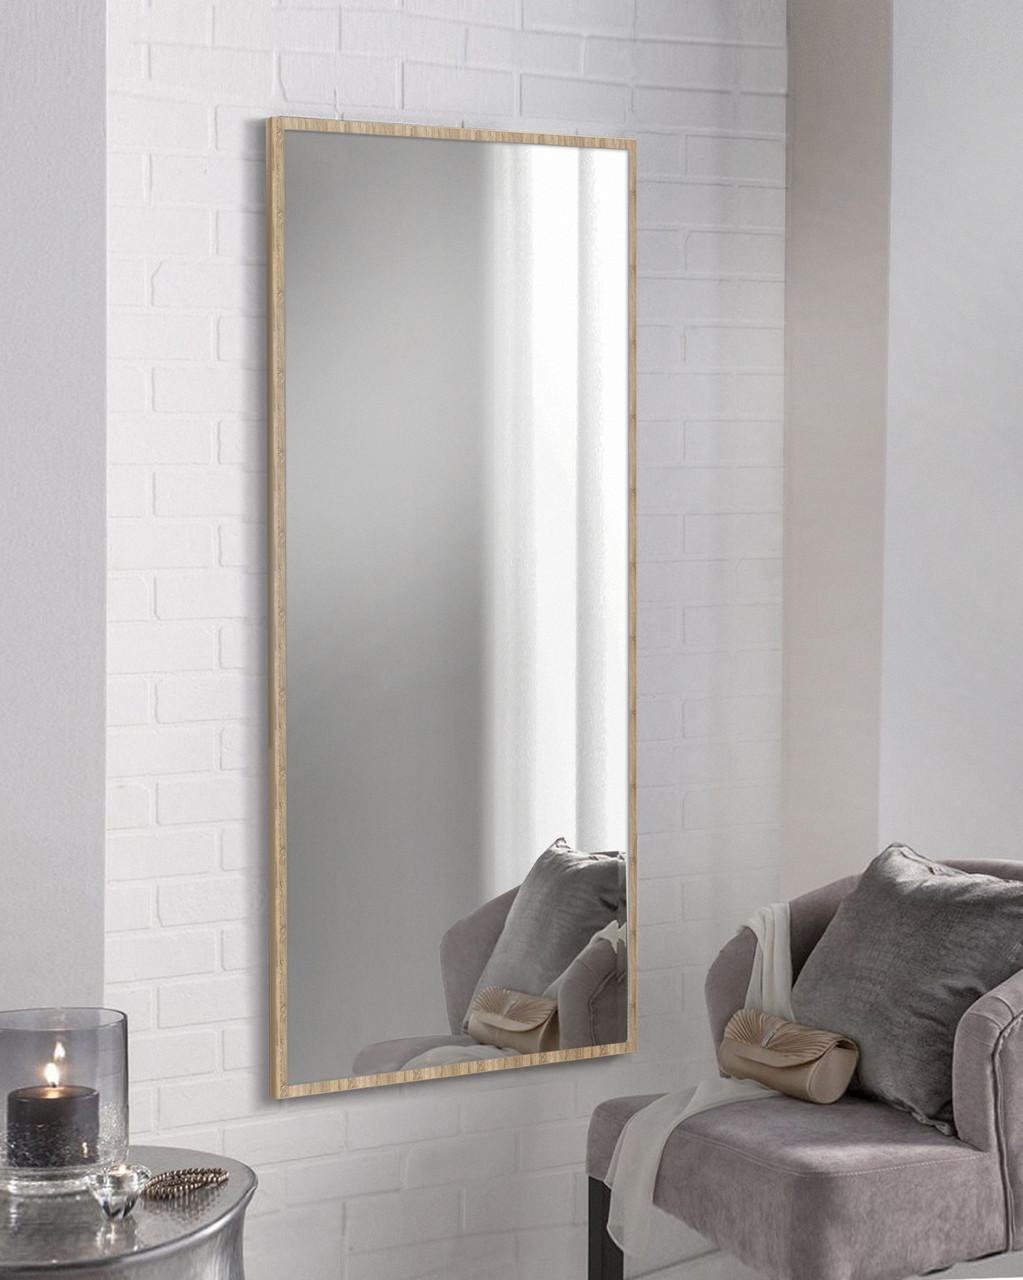 Зеркало настенное дуб сонома 1300х600 мм | Дзеркало настінне дуб сонома 1300х600 мм